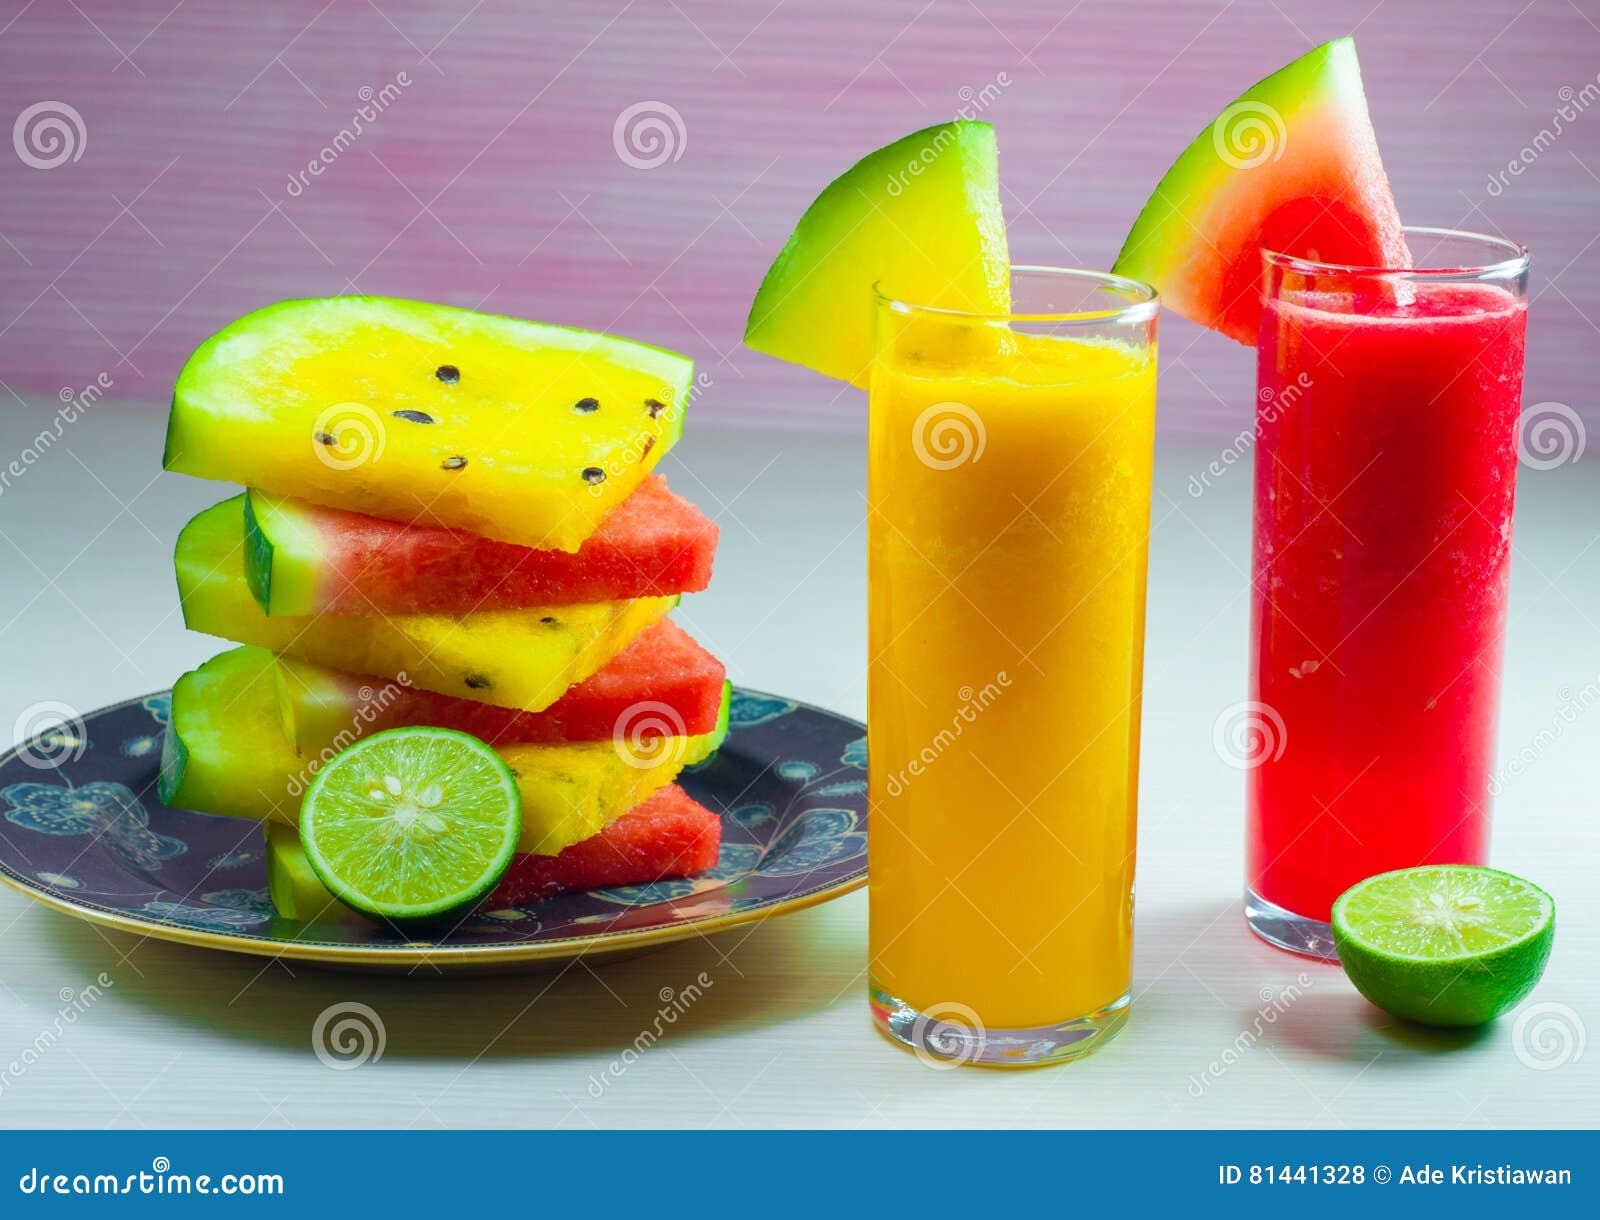 Фруктовый сок арбуза и свежий плодоовощ арбуза